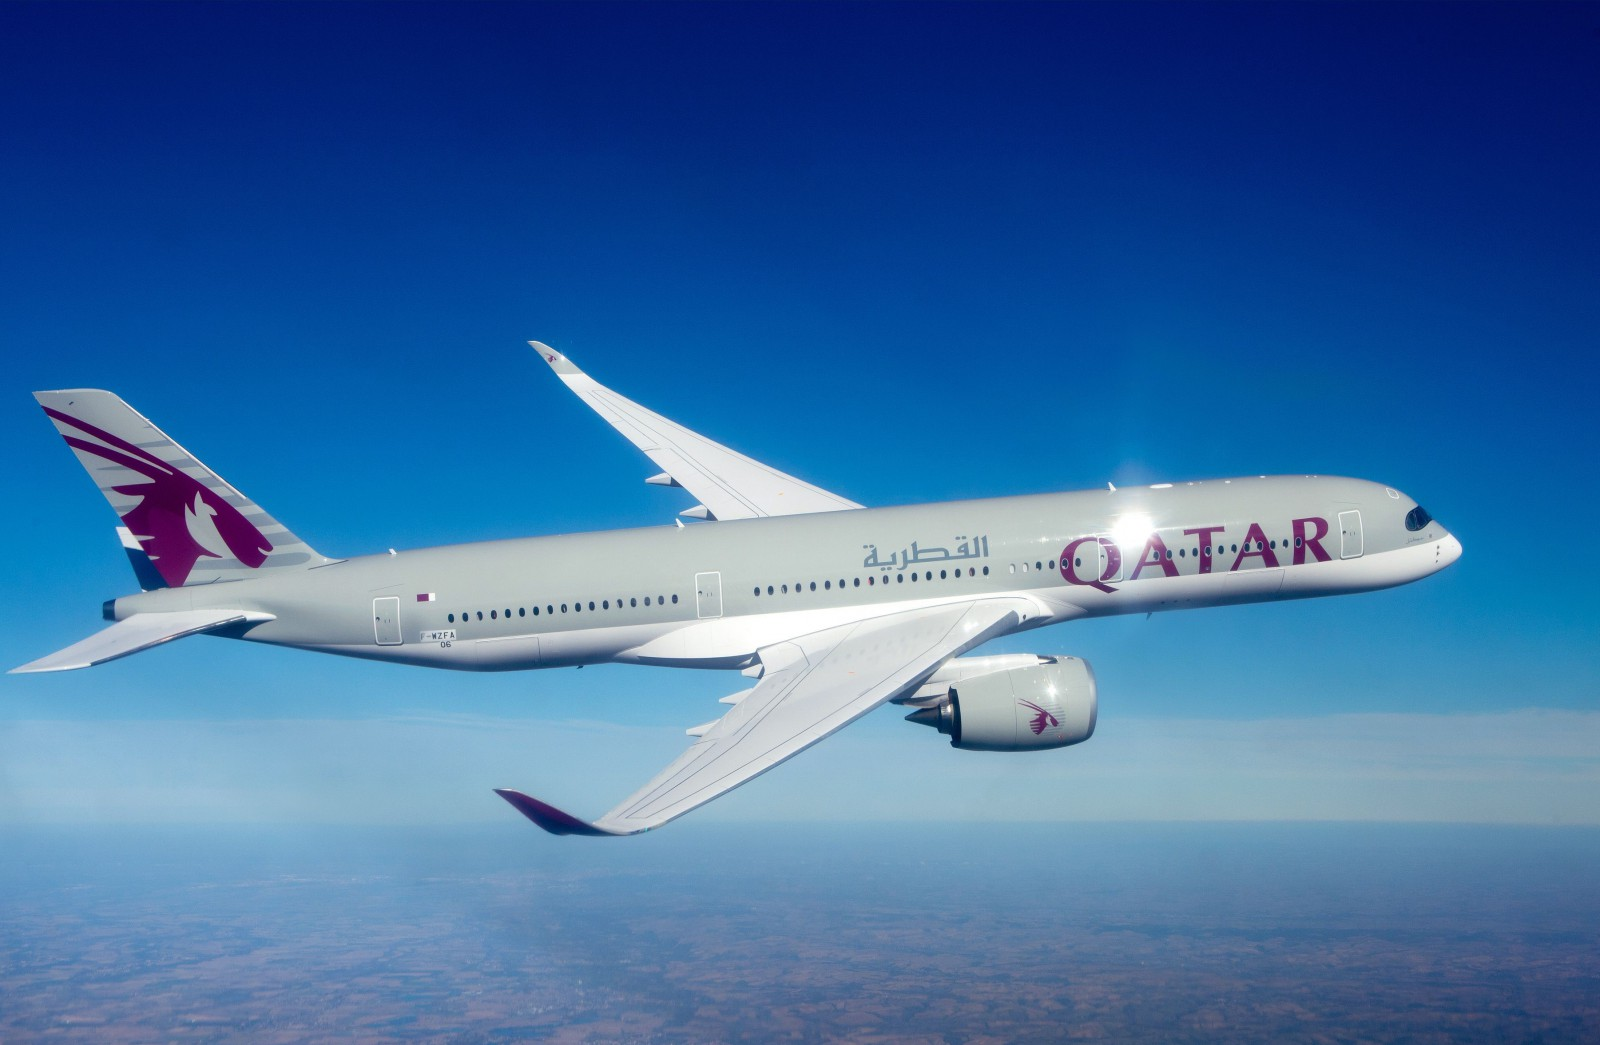 qatar airways flights 0/1–4 qatar airways fleet 1/1–2 qatar airways cargo 0/1–4 business class 1/9–29 hamad international airport 0/1–4 qatar duty free 1/1–2 economy class 1/3–8 privilege club 0/11–43 airline operates 0/1–2 asia canada 0/2–8 al mourjan business lounge 0/1–2 class seats 0/1–2 first class seats 0/1–2 first flight 0/1–2 first class 0/7–29 flights 2/13–36 airline 6/12–21 qatar 92/51–93 flight 0/17–